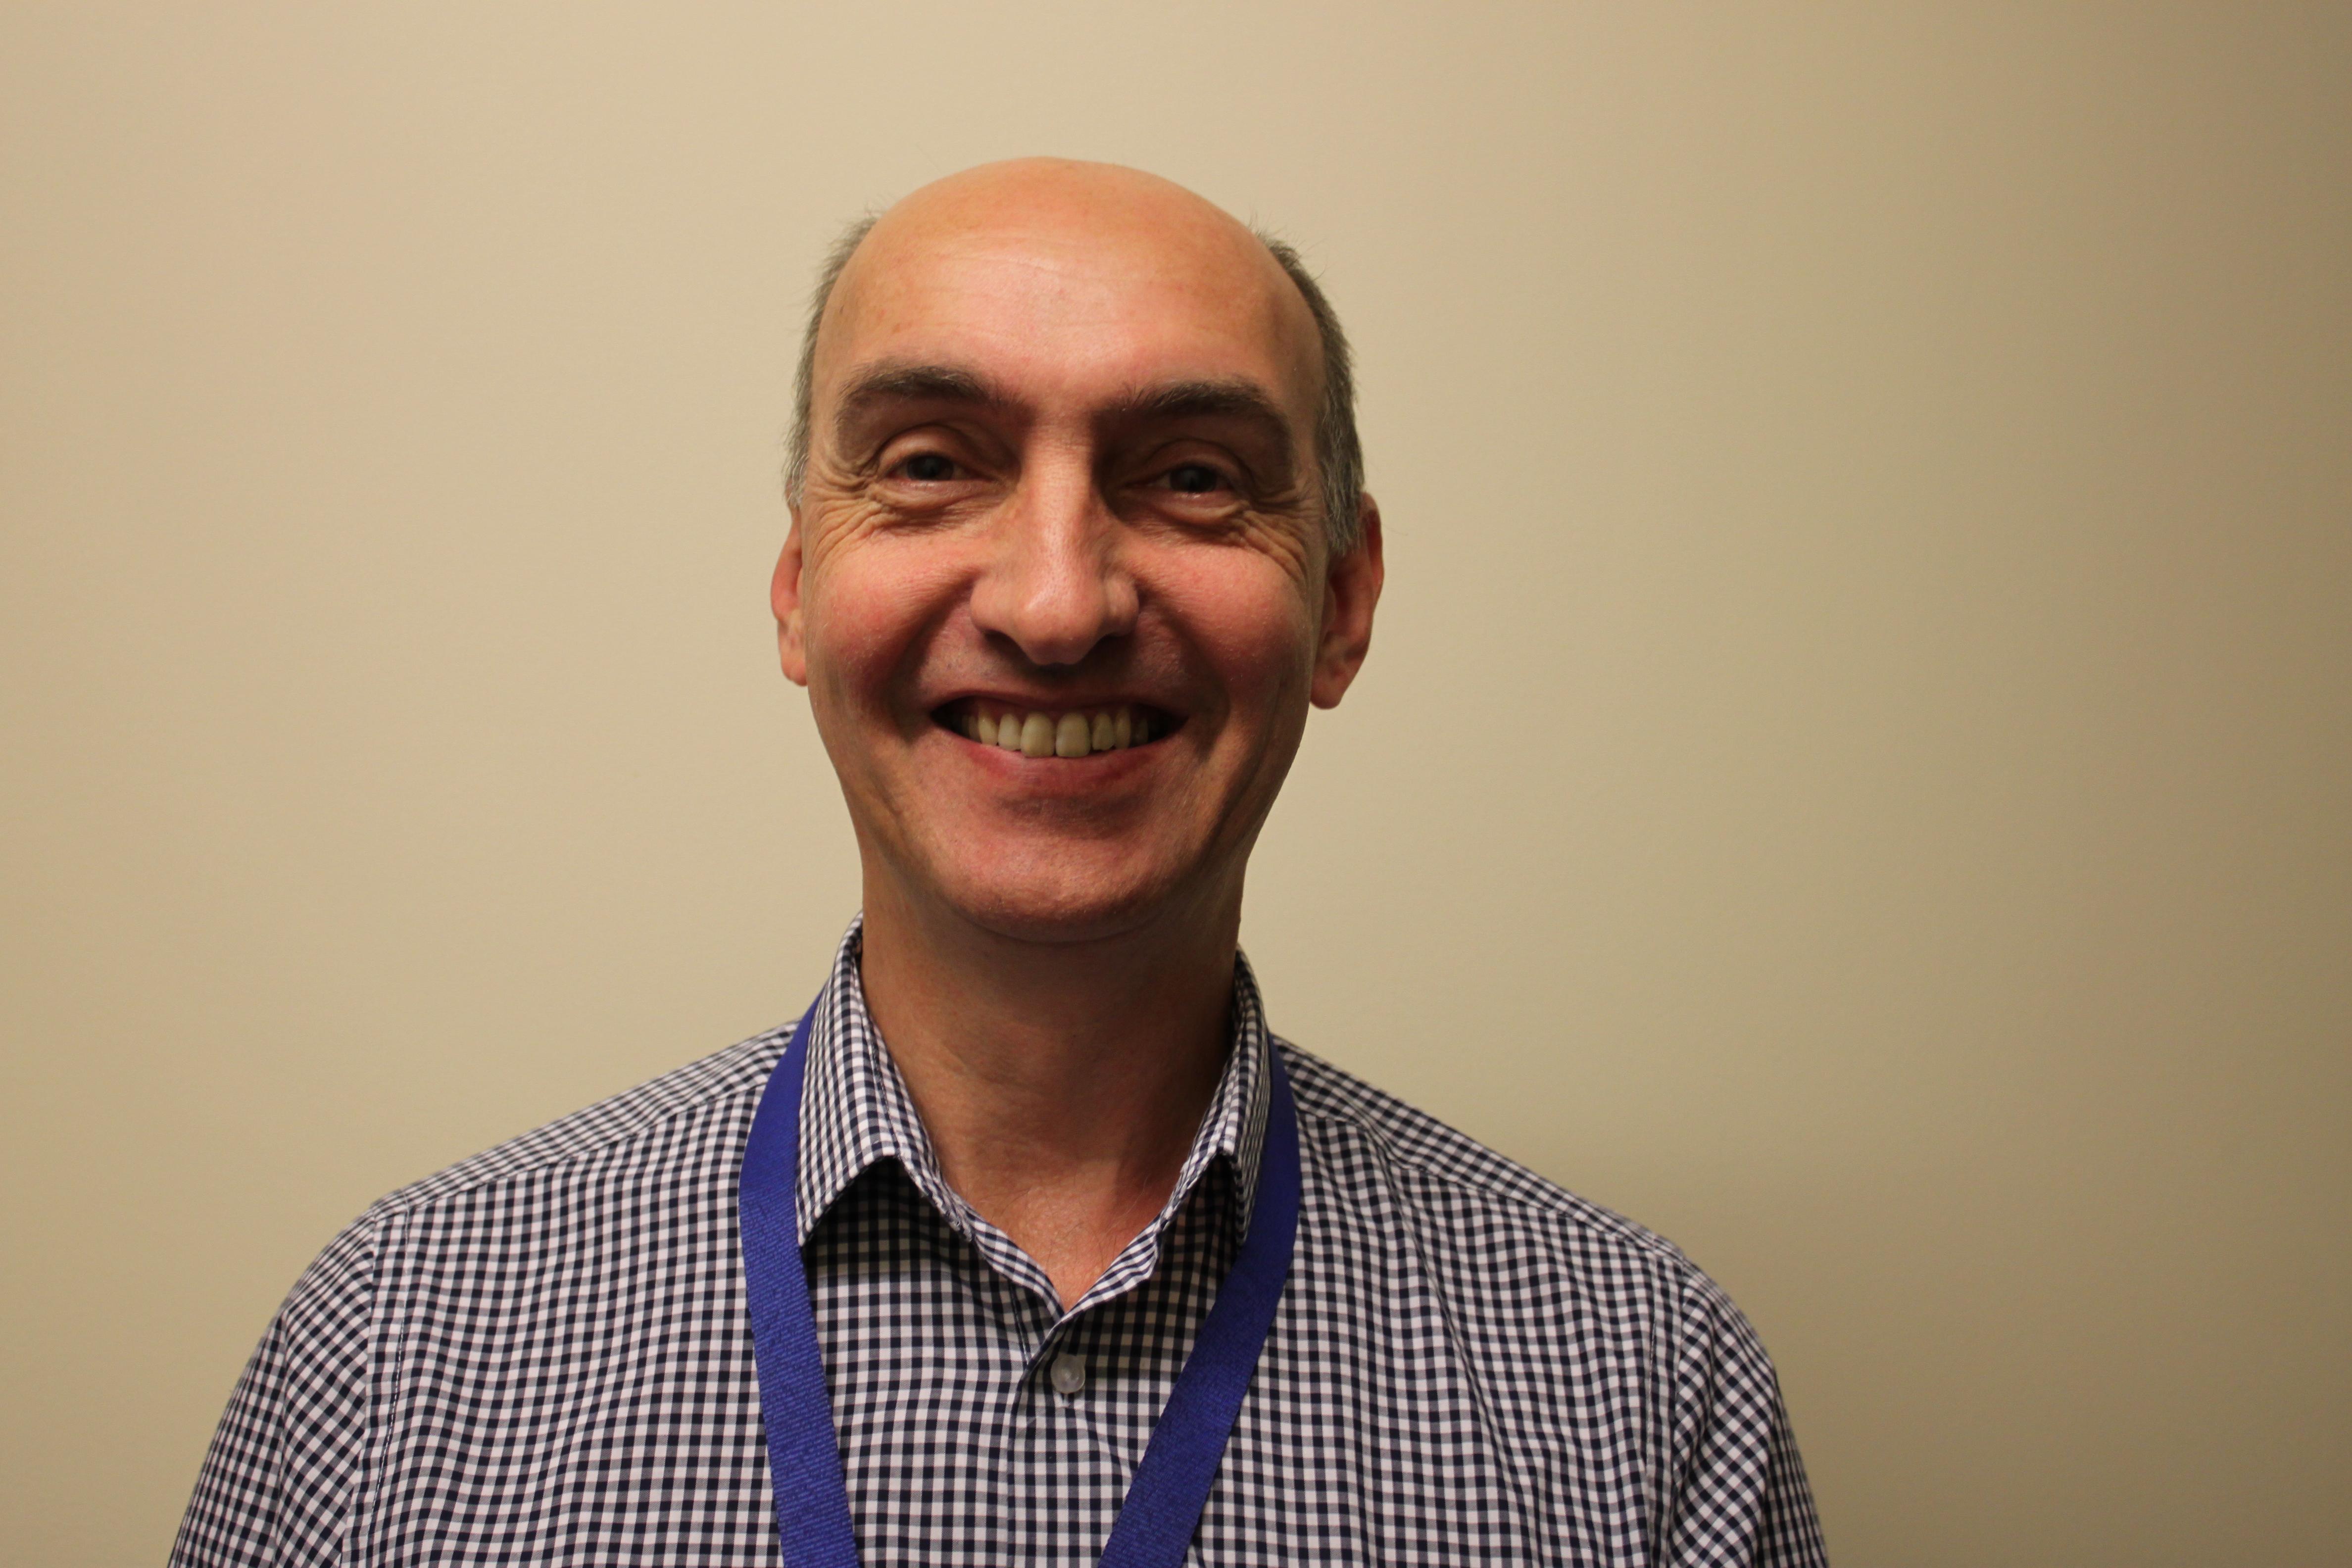 Mr David Bennett